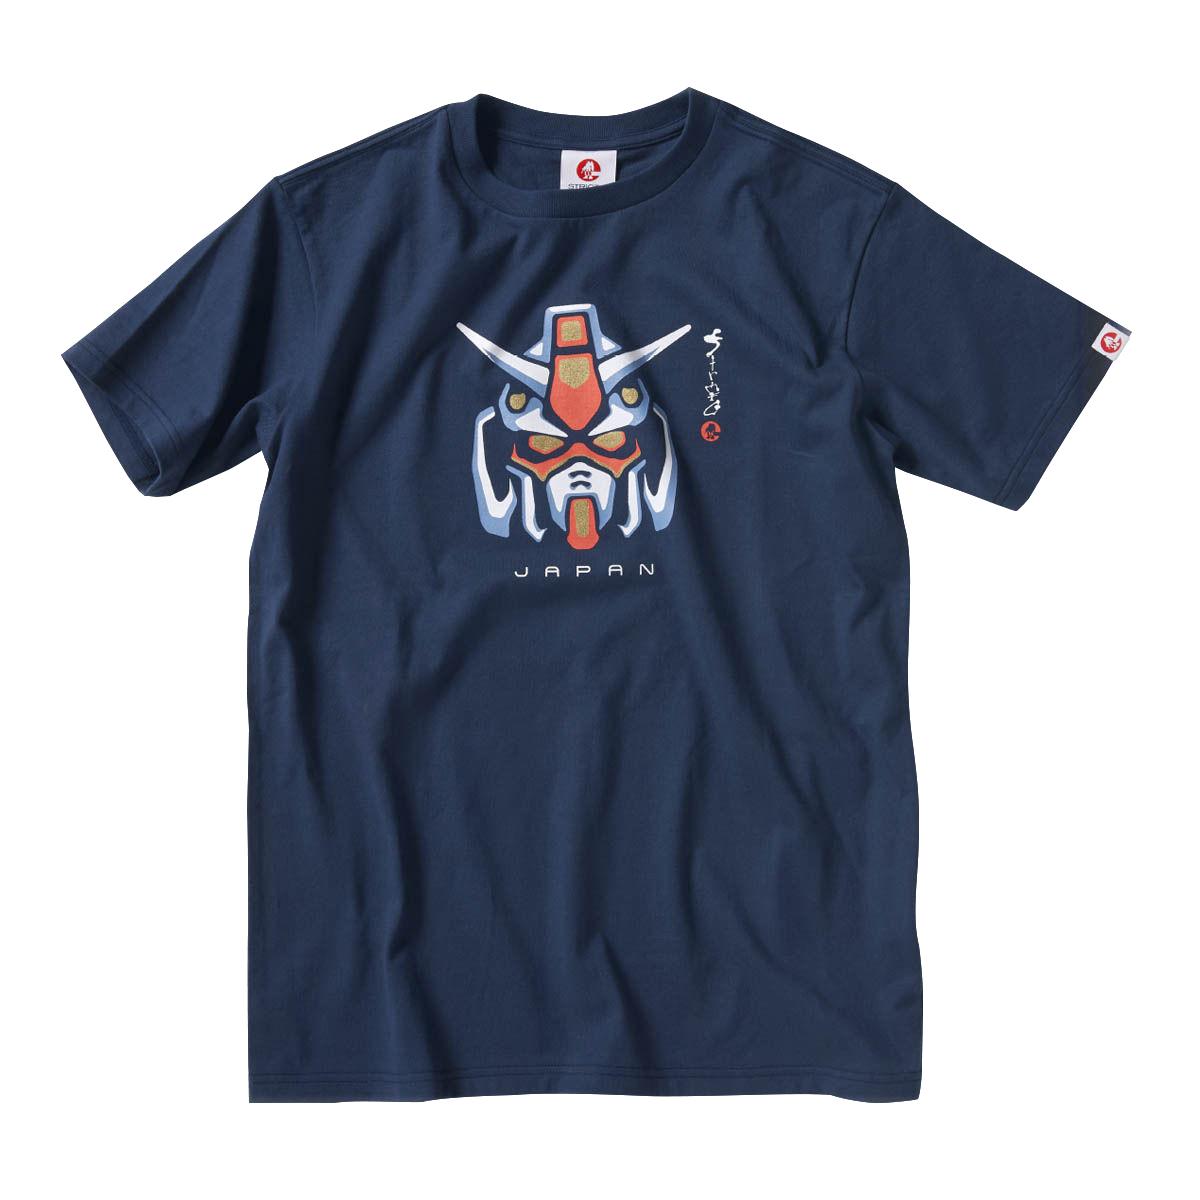 Gundam Motif T-shirt—Mobile Suit Gundam/STRICT-G JAPAN Collaboration